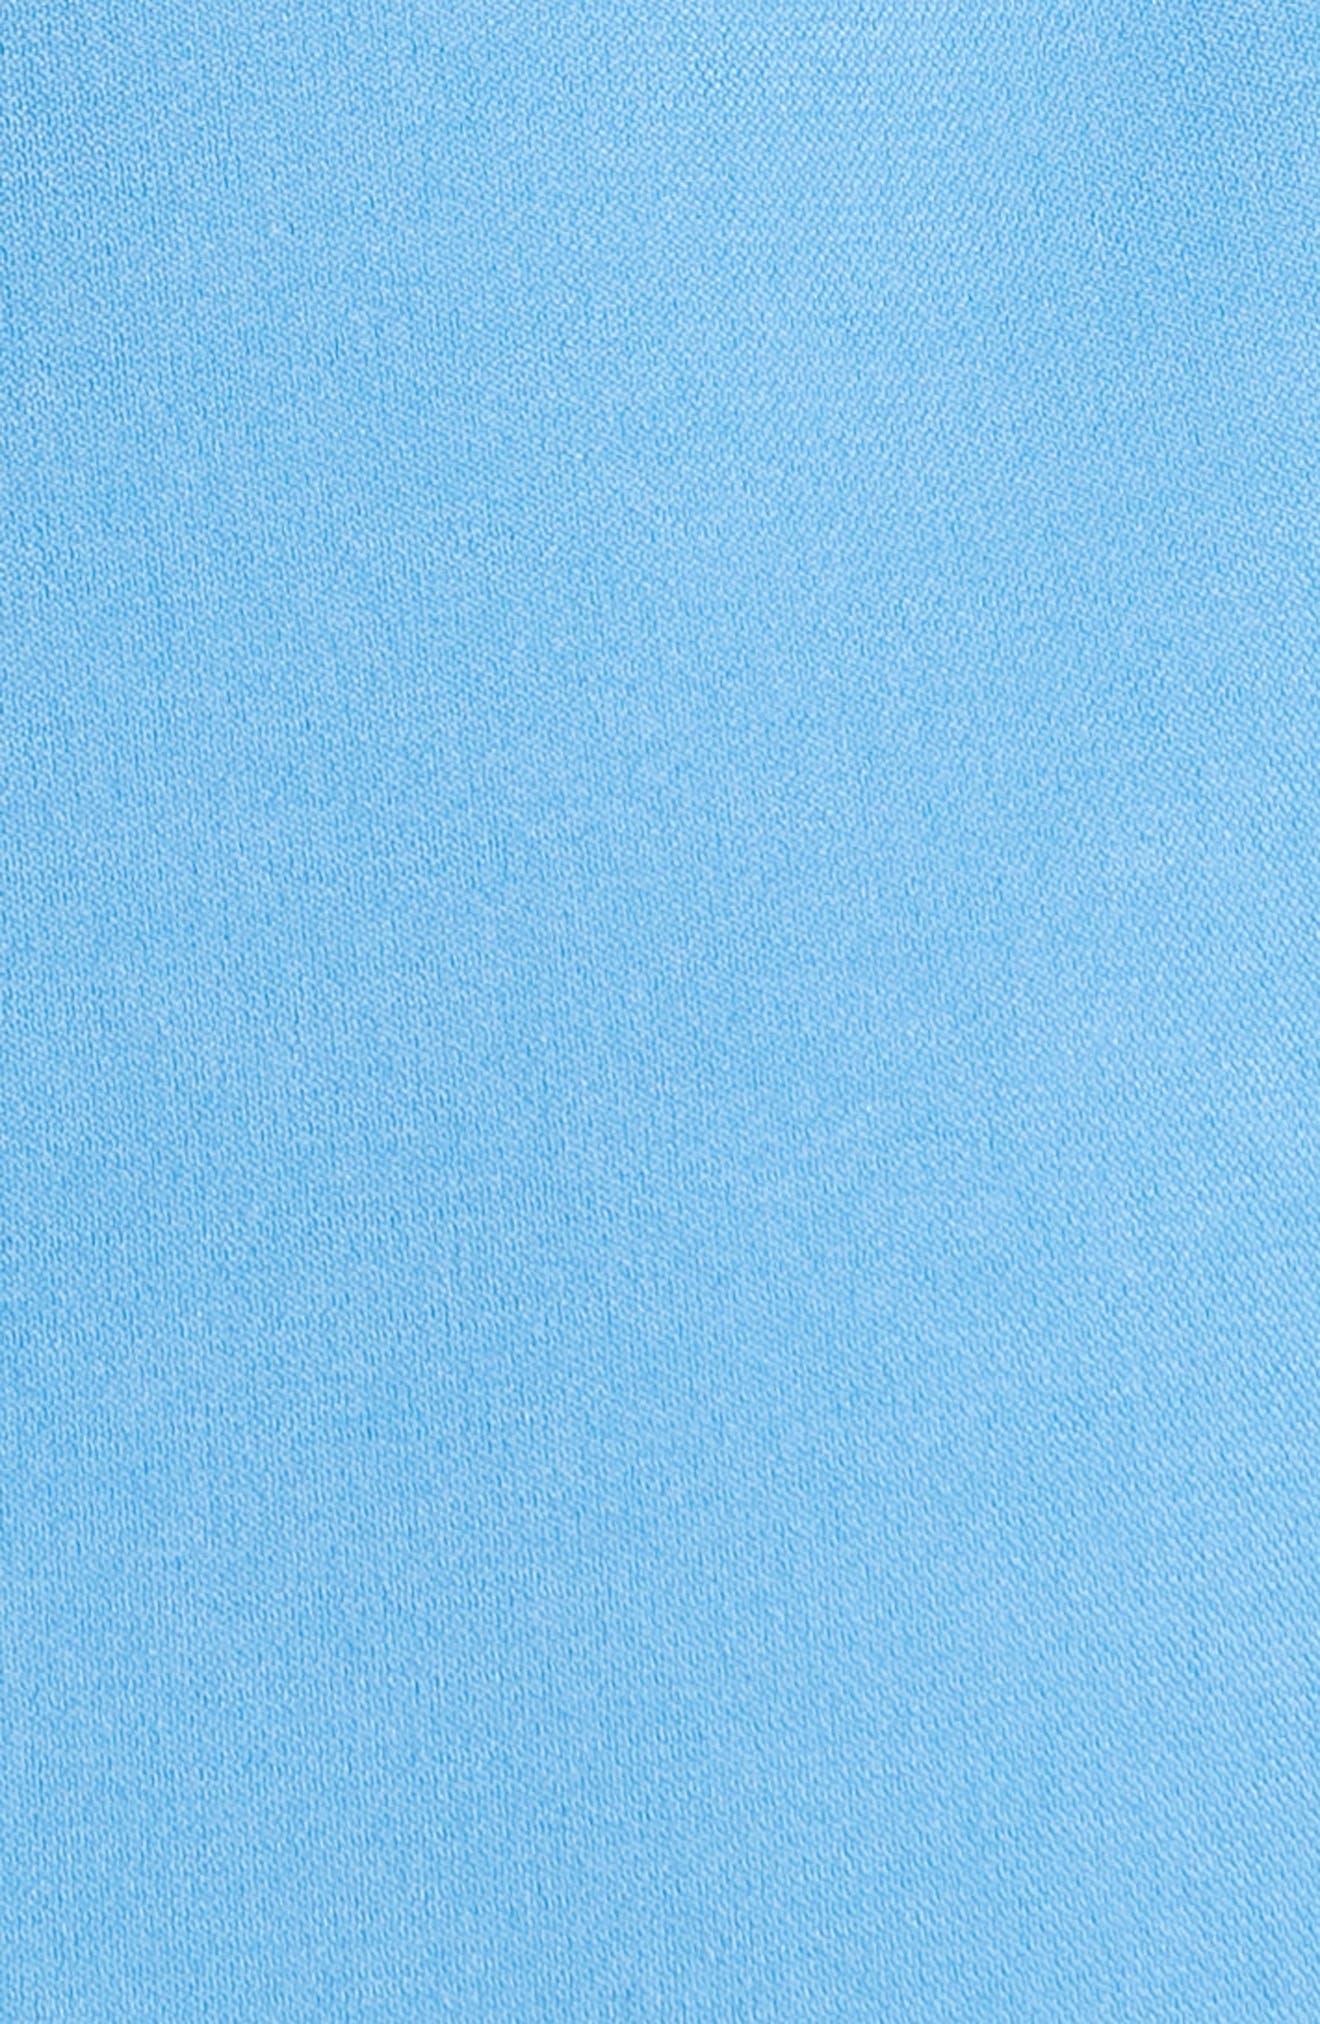 Essi Balloon Sleeve Crepe Satin Dress,                             Alternate thumbnail 5, color,                             Agapanthus